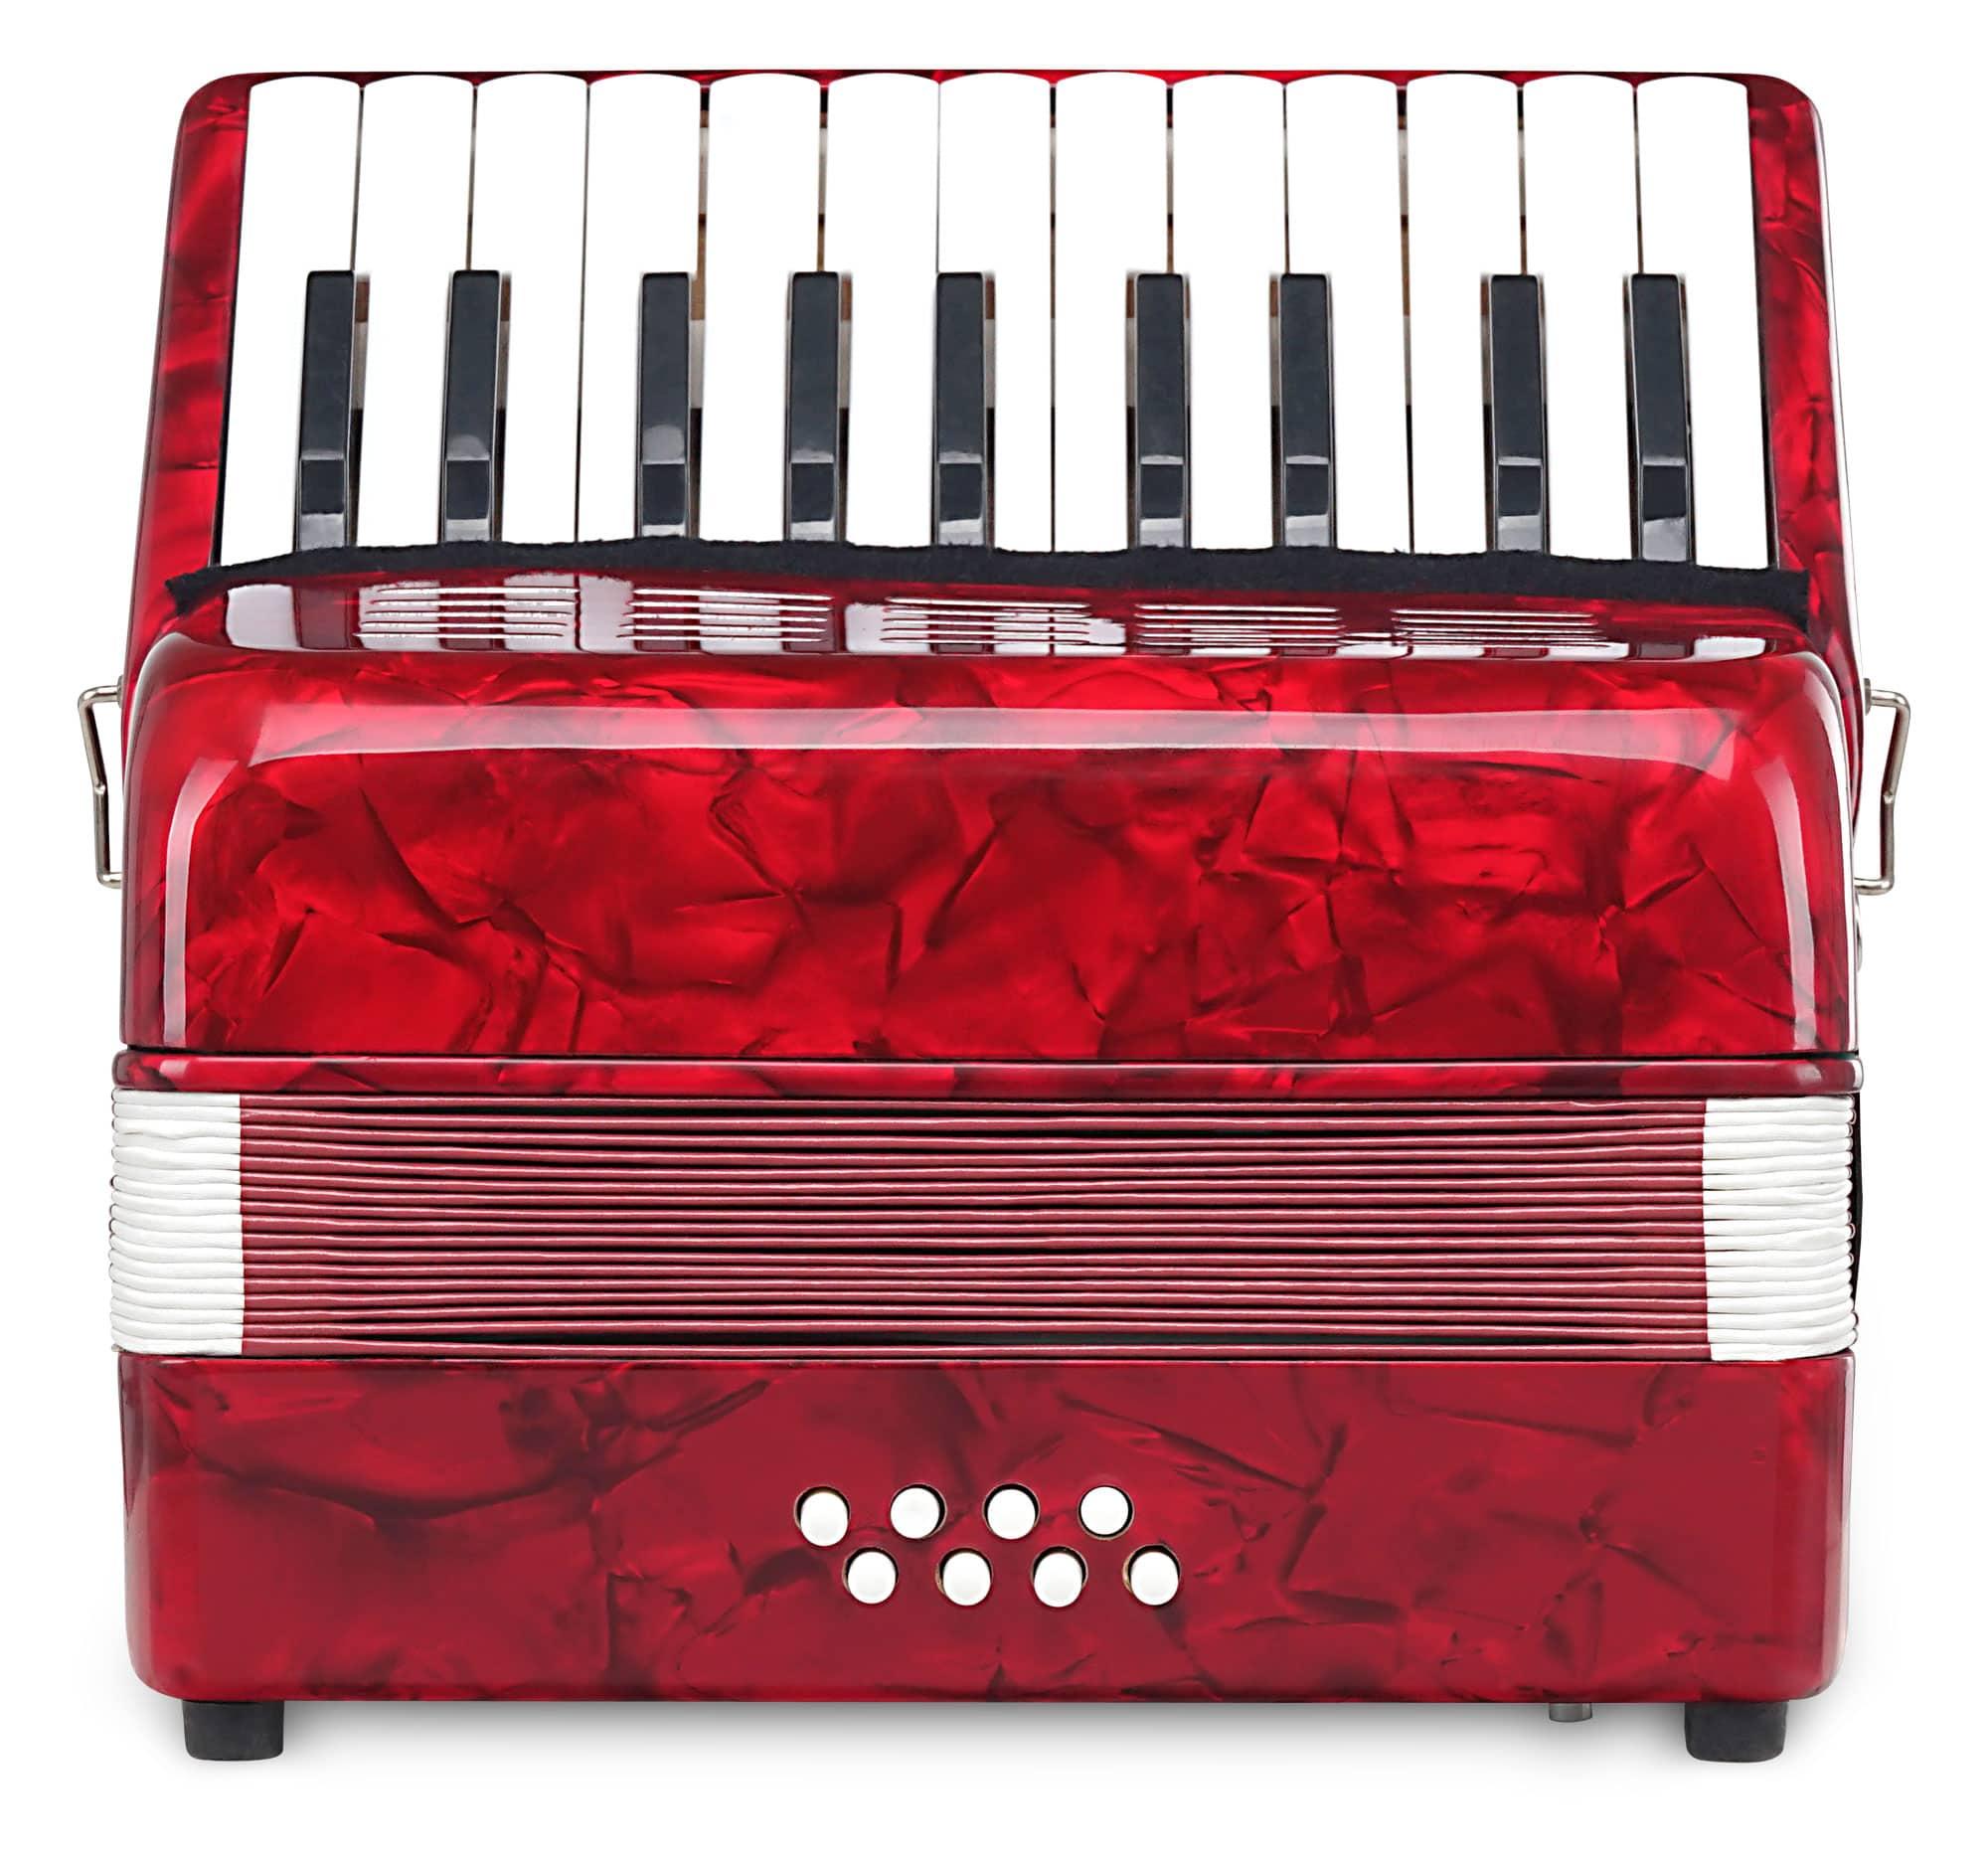 Classic Cantabile Secondo Kinder Akkordeon 8 Bass rot Retoure (Verpackungsschaden)